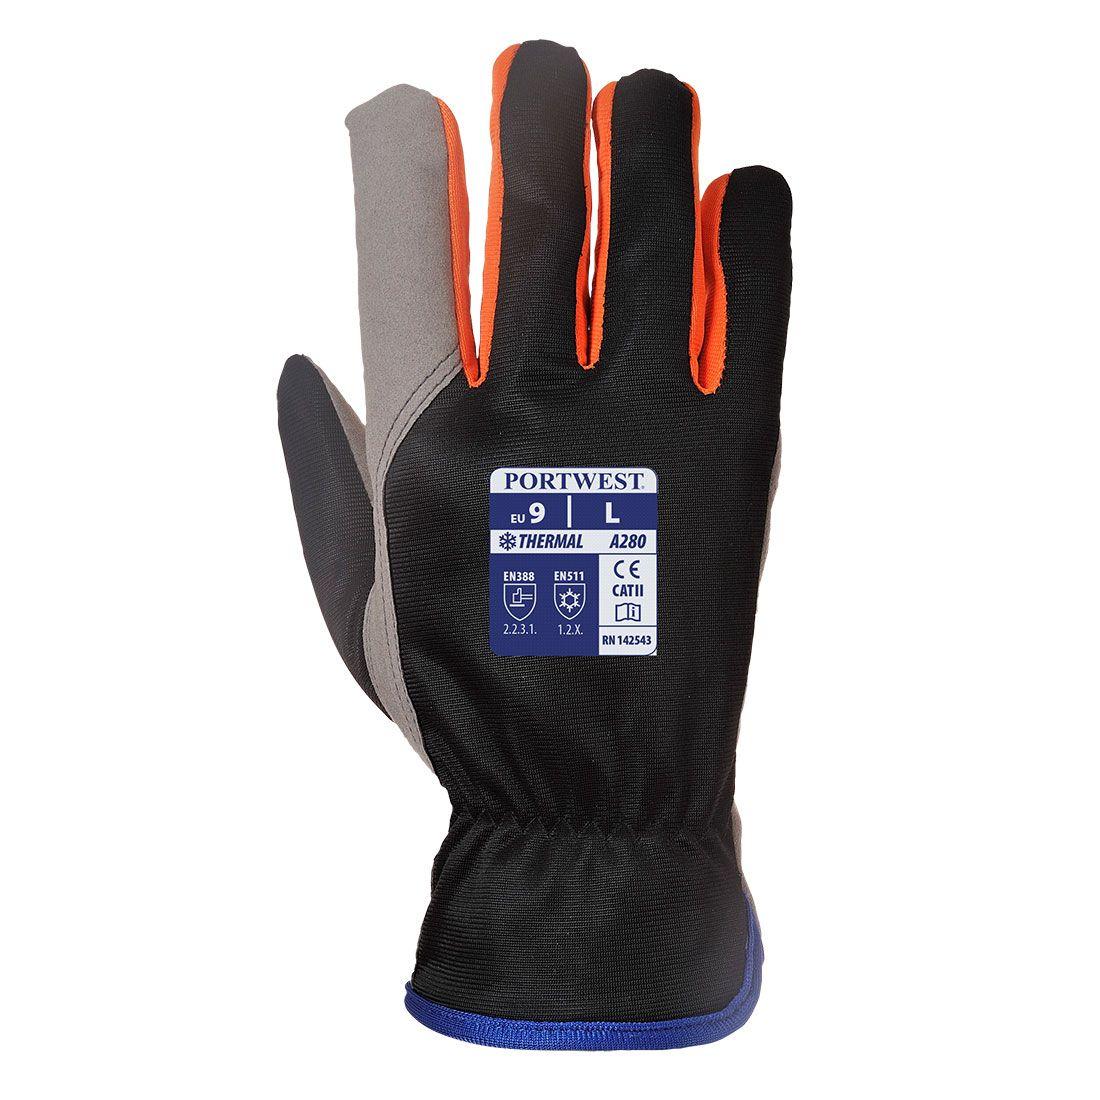 Portwest Handschoenen A280 zwart-oranje(K1)